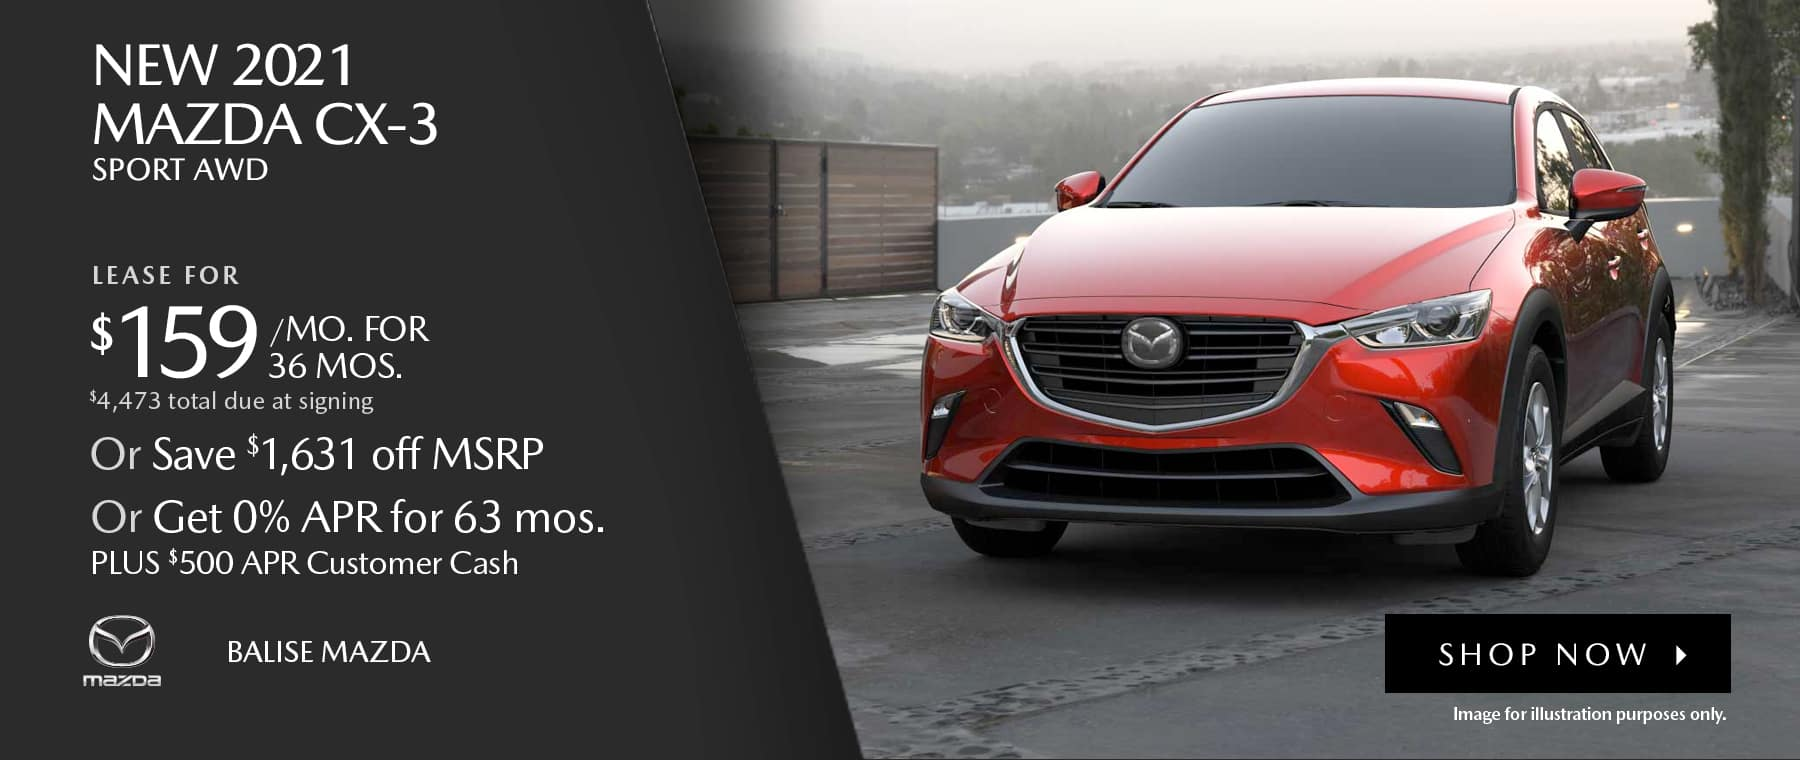 BMAZ-HomePageBanner-1800×760-New 2021 Mazda CX-3 Sport AWD_04'21